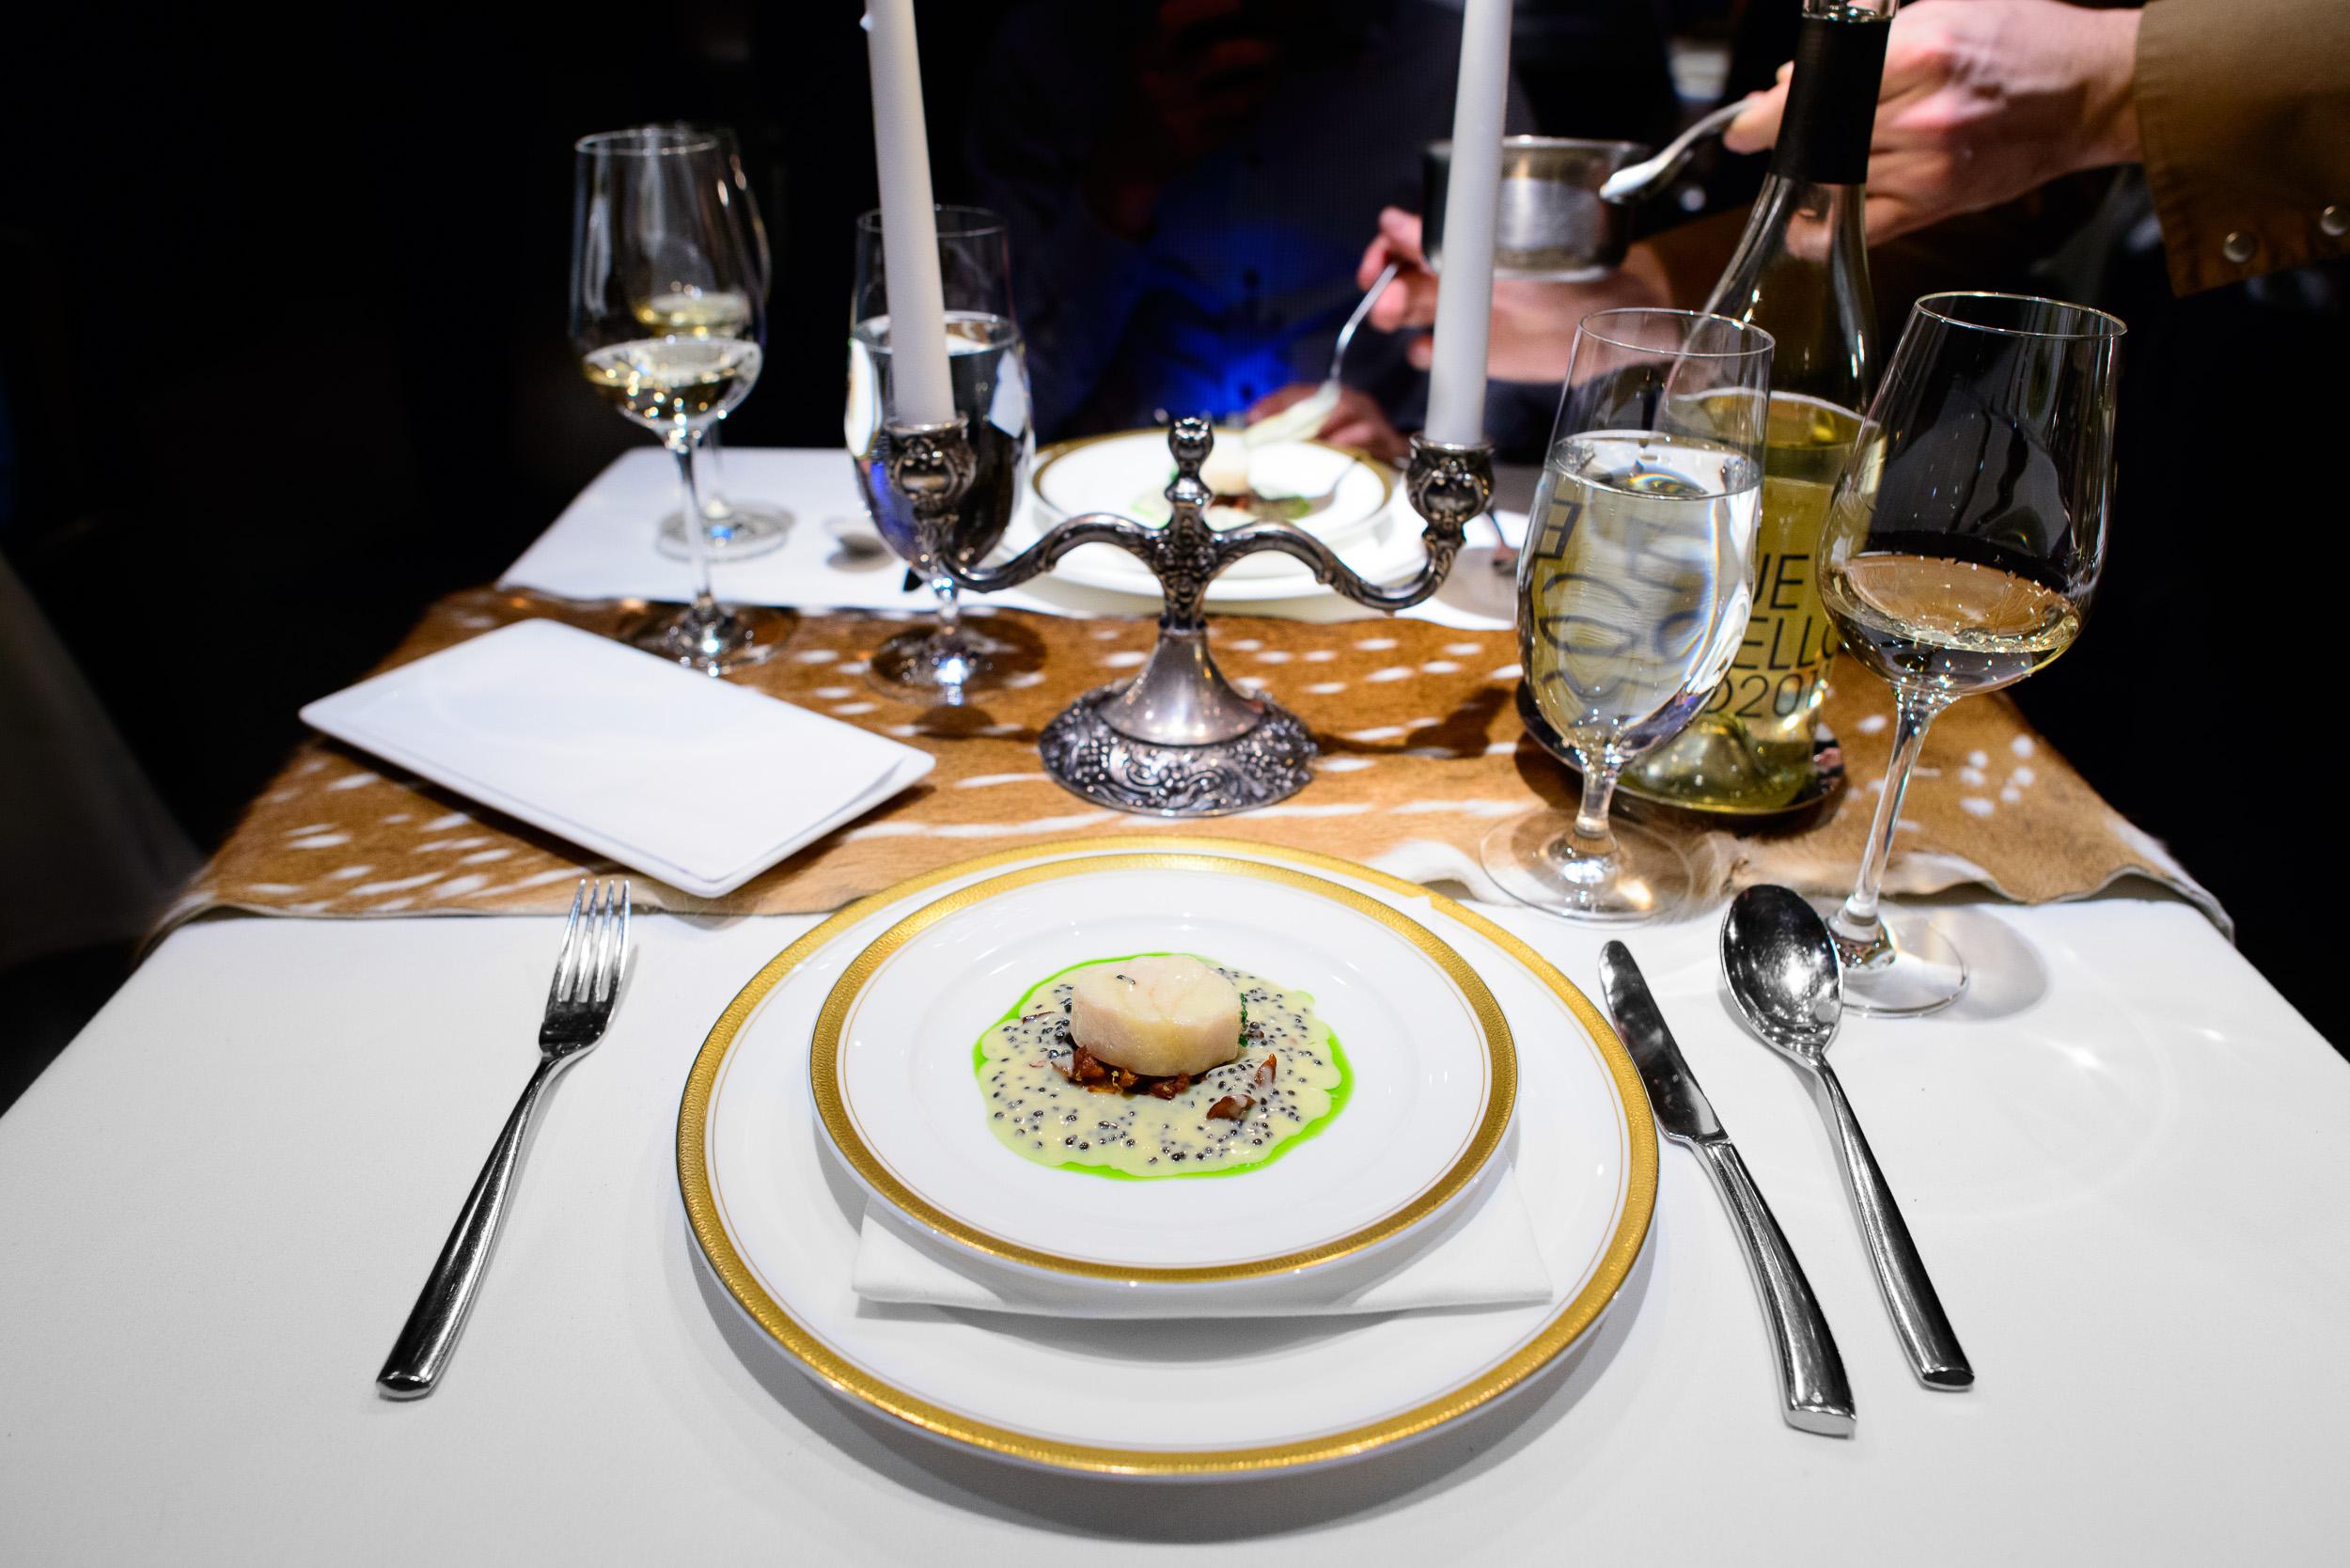 8th Course: Sturgeon & Caviar